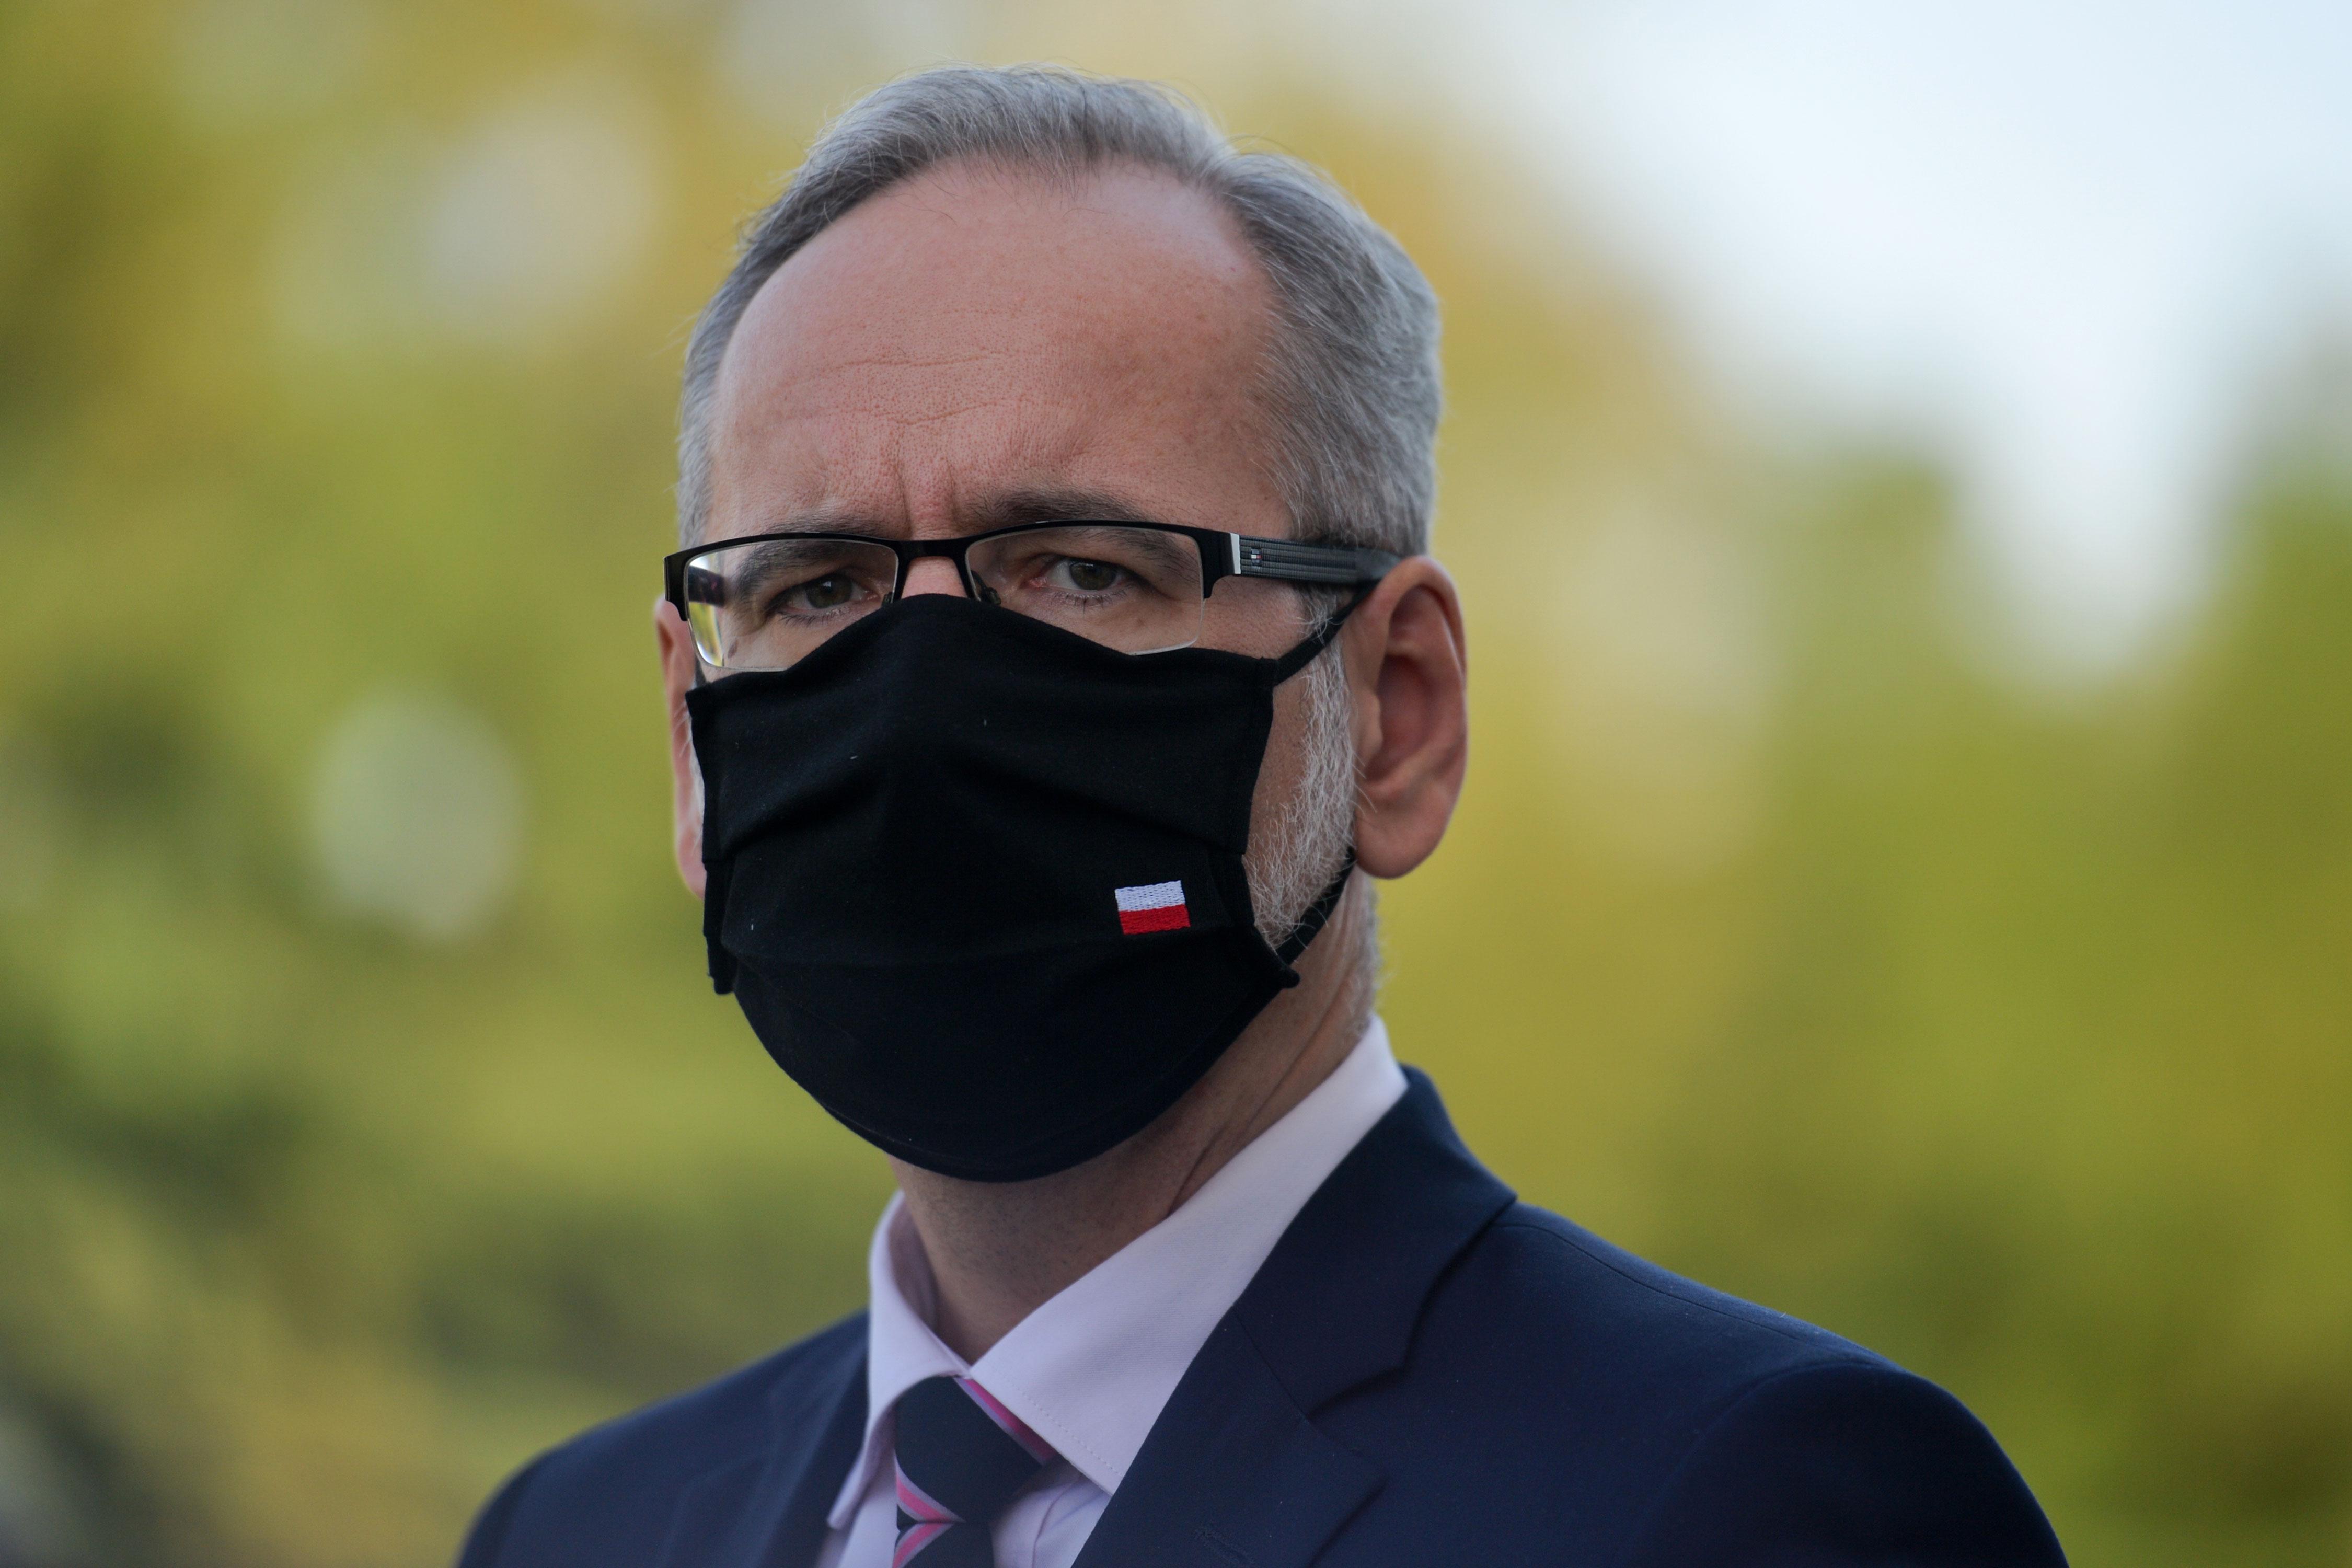 Polish health minister Adam Niedzielski attends a press briefing in Kraków, Poland, in September 2020.